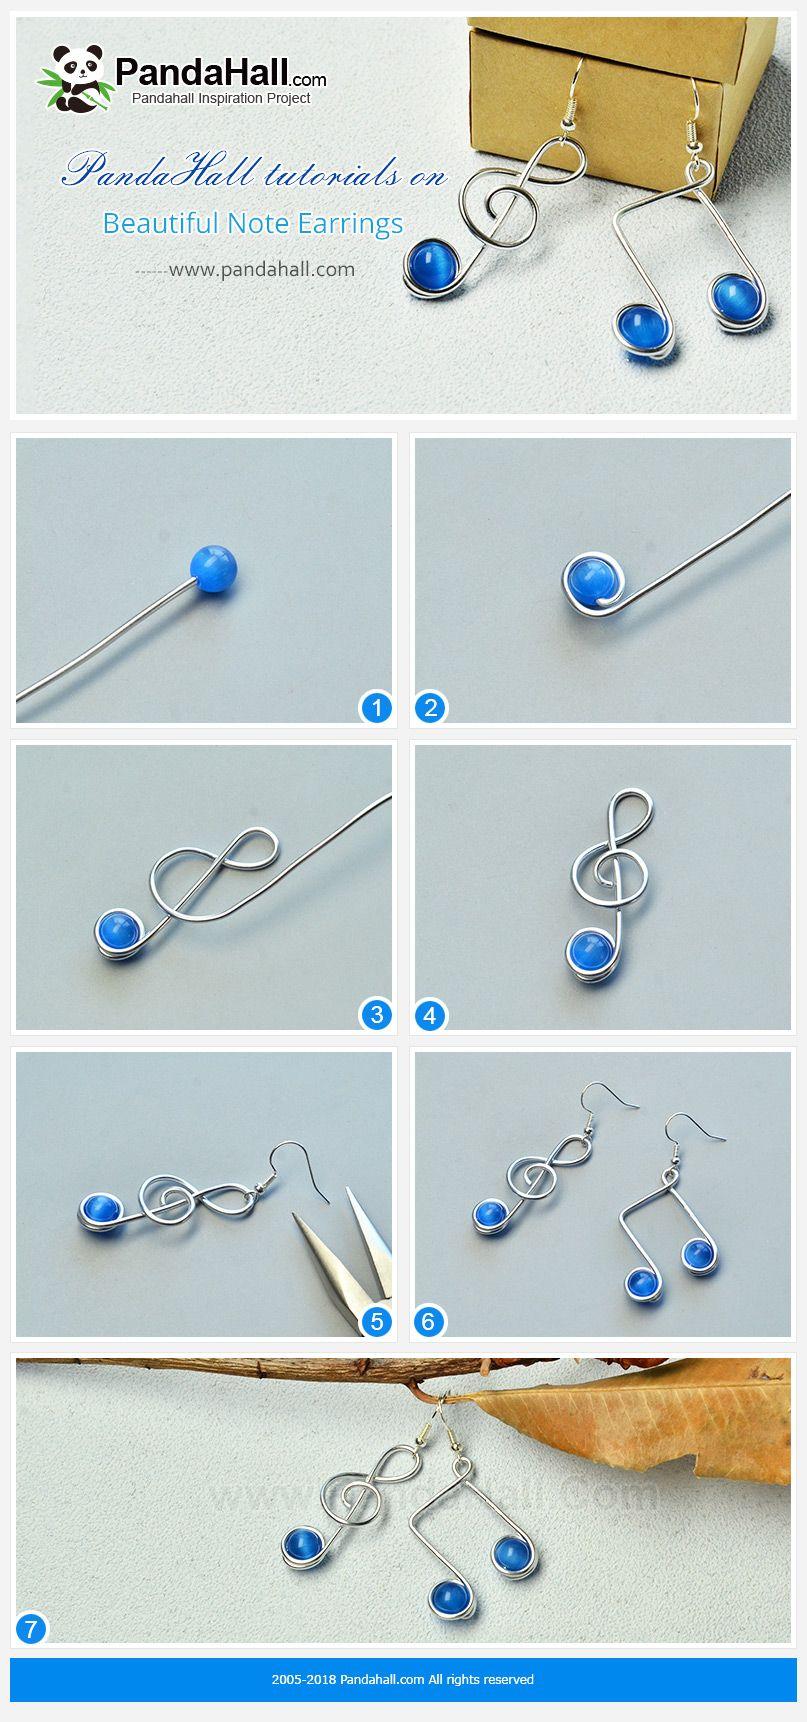 Jewelry making: 17 diy jewelry making tutorials on how to make.